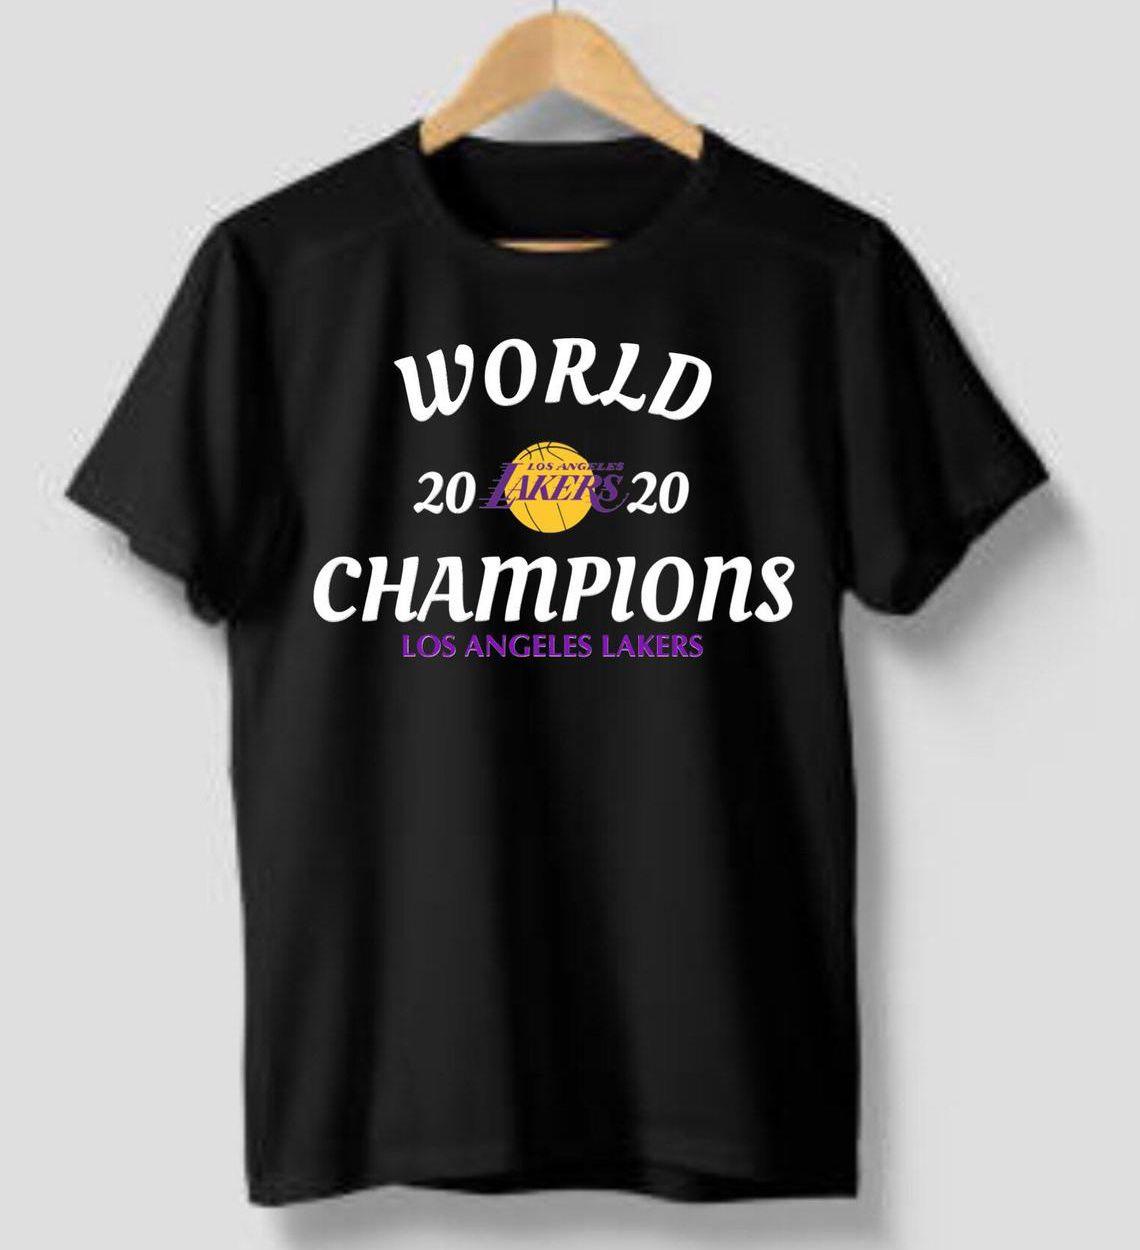 World 2020 Los Angeles Lakers Champions T-Shirt